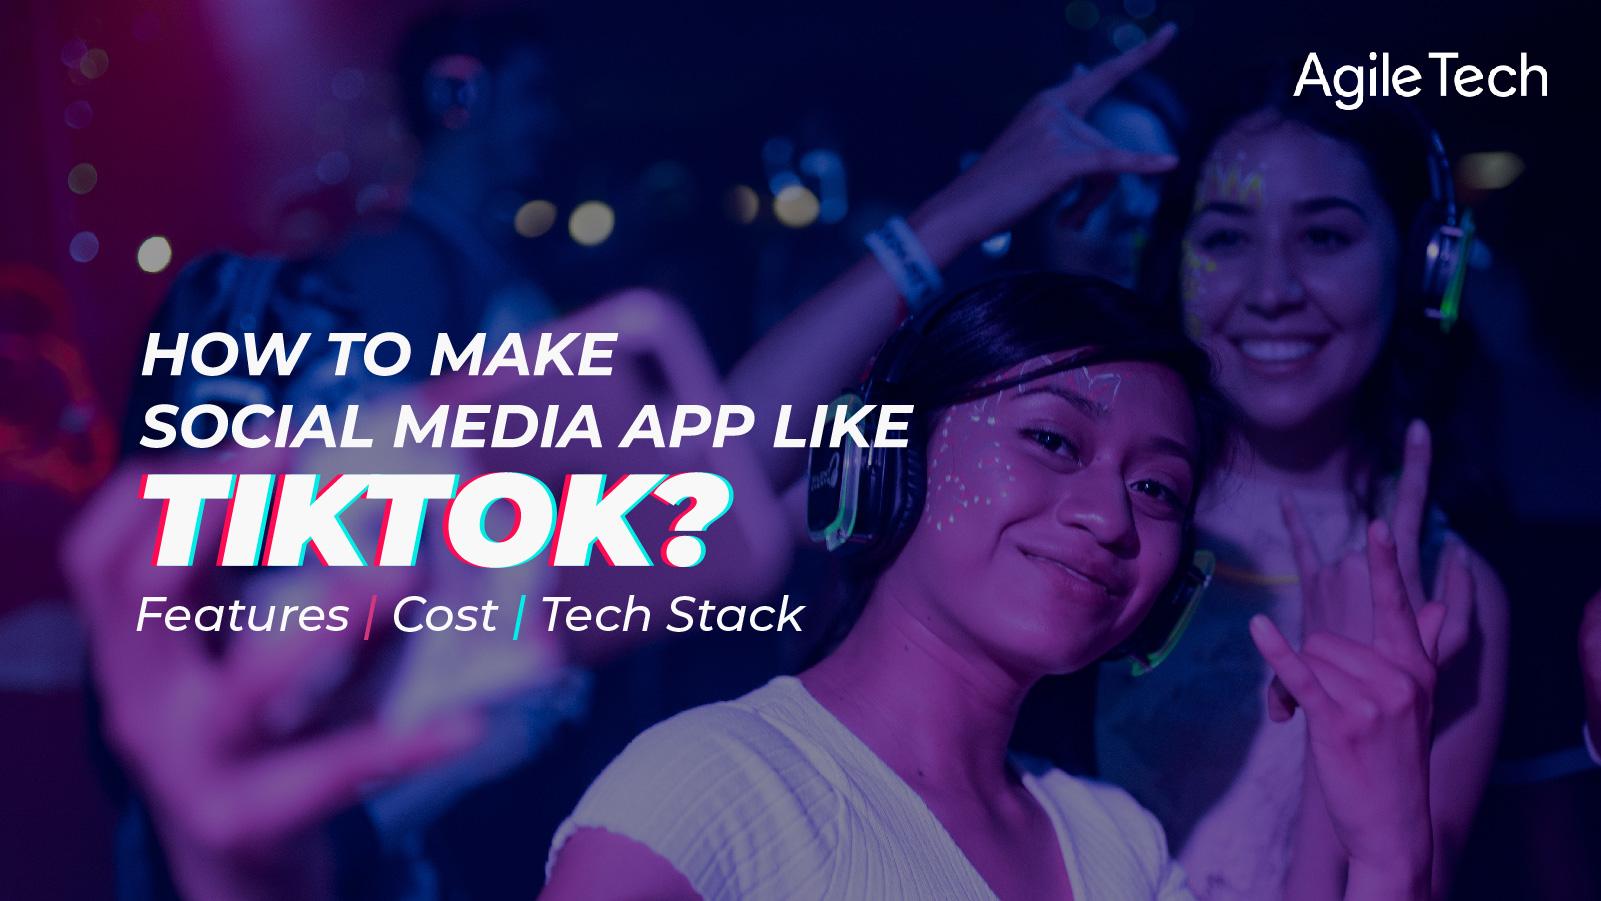 how to make social media app like tiktok how to build app like tinder tinder like app tinder clone app app like tiktok cost by agiletech